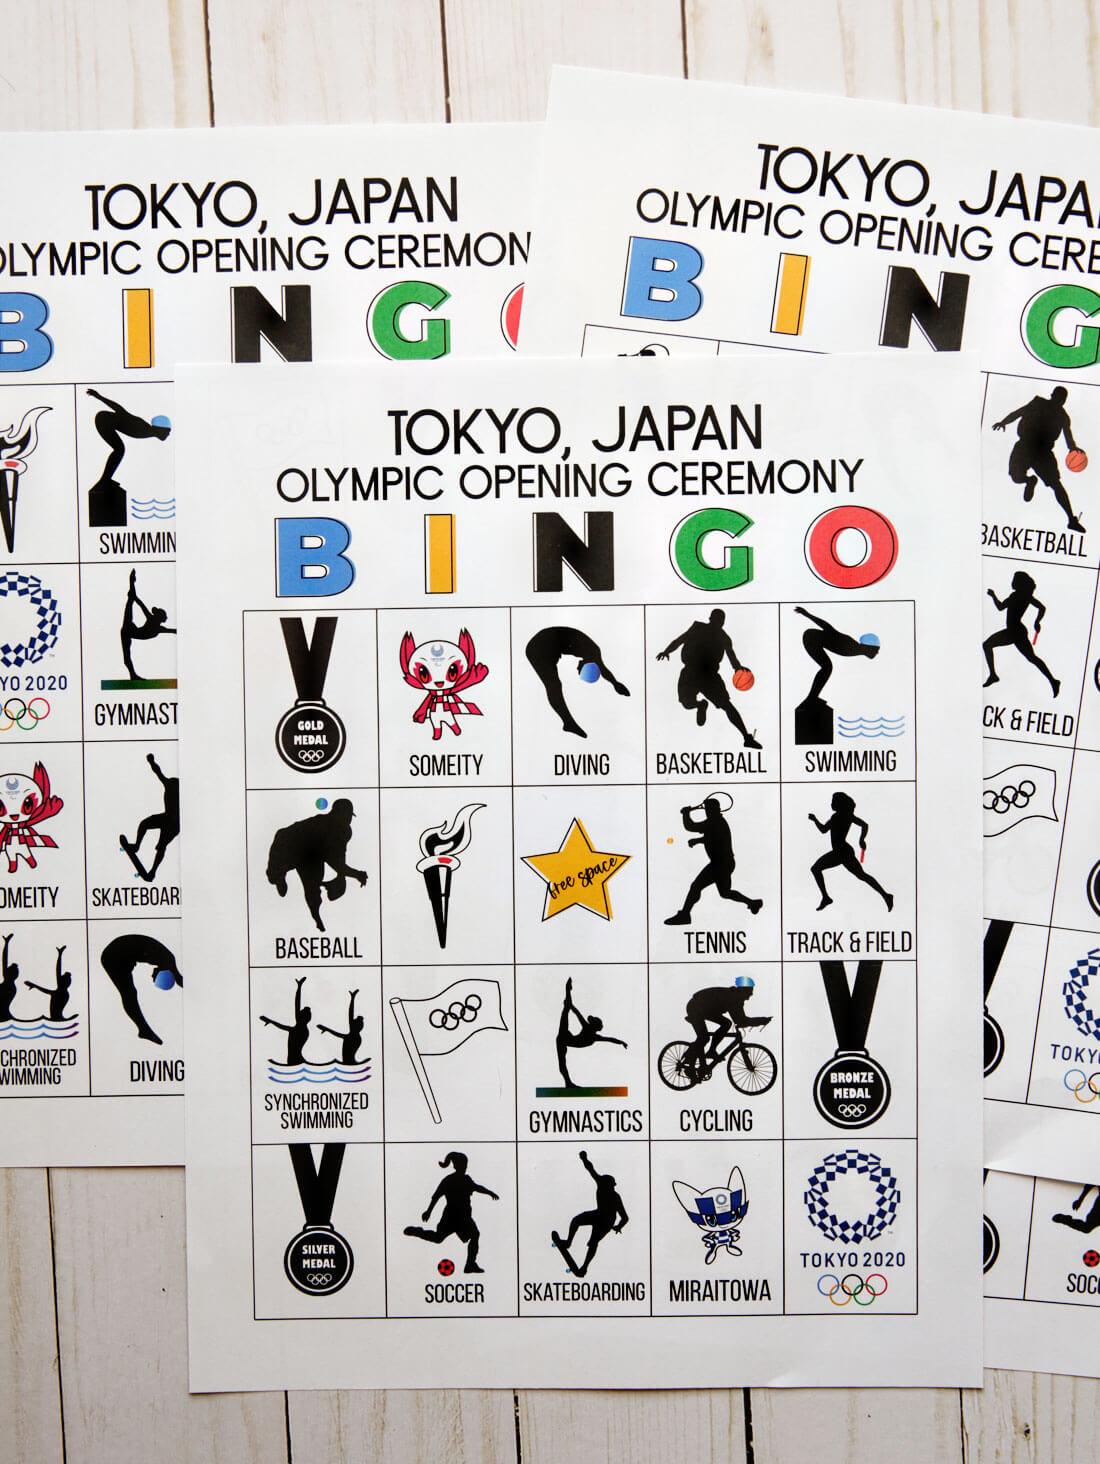 Olympics Opening Ceremony BINGO for Japan